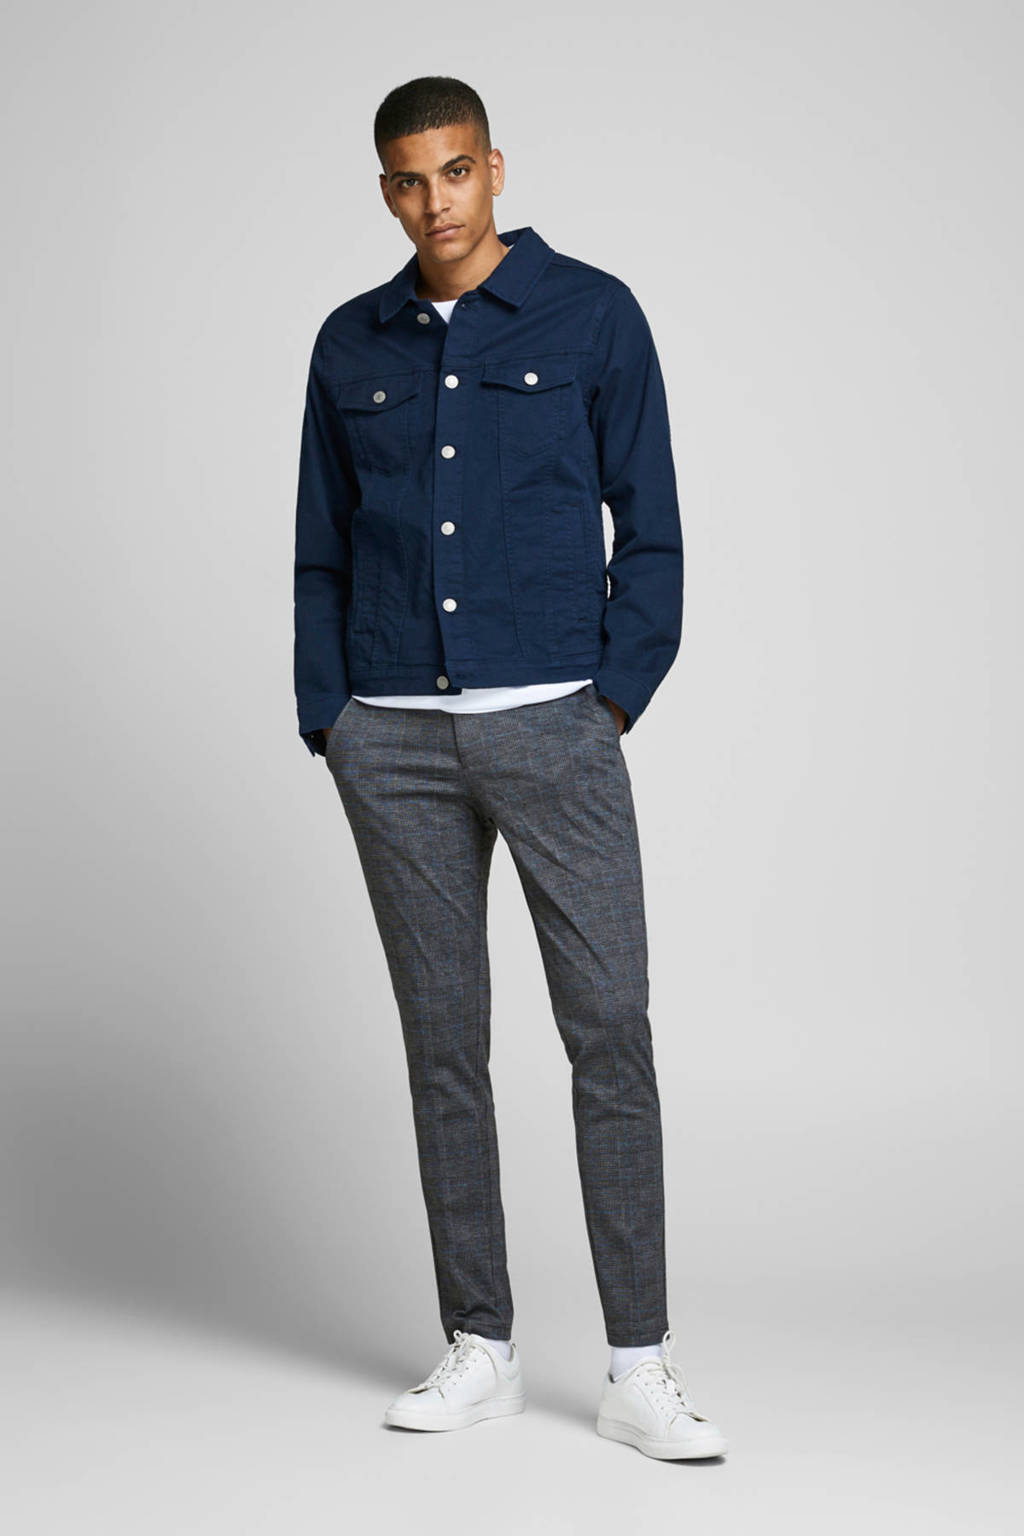 JACK & JONES JEANS INTELLIGENCE geruite slim fit pantalon Marco grijs/zwart/blauw, Grijs/zwart/blauw